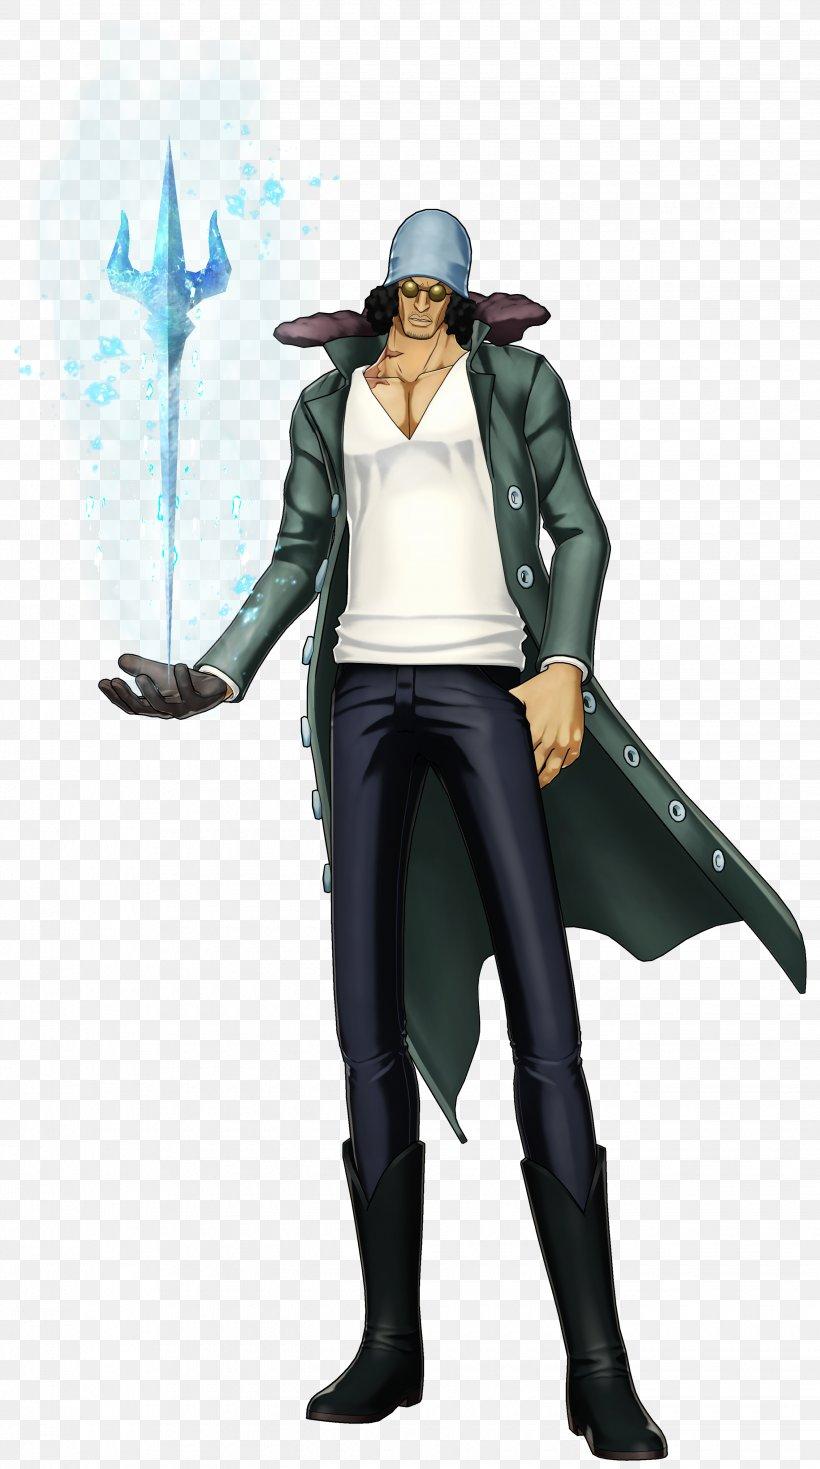 Akainu One Piece: World Seeker Crocodile Monkey D. Luffy Kuzan, PNG, 2650x4750px, Akainu, Action Figure, Bandai Namco Entertainment, Costume, Crocodile Download Free